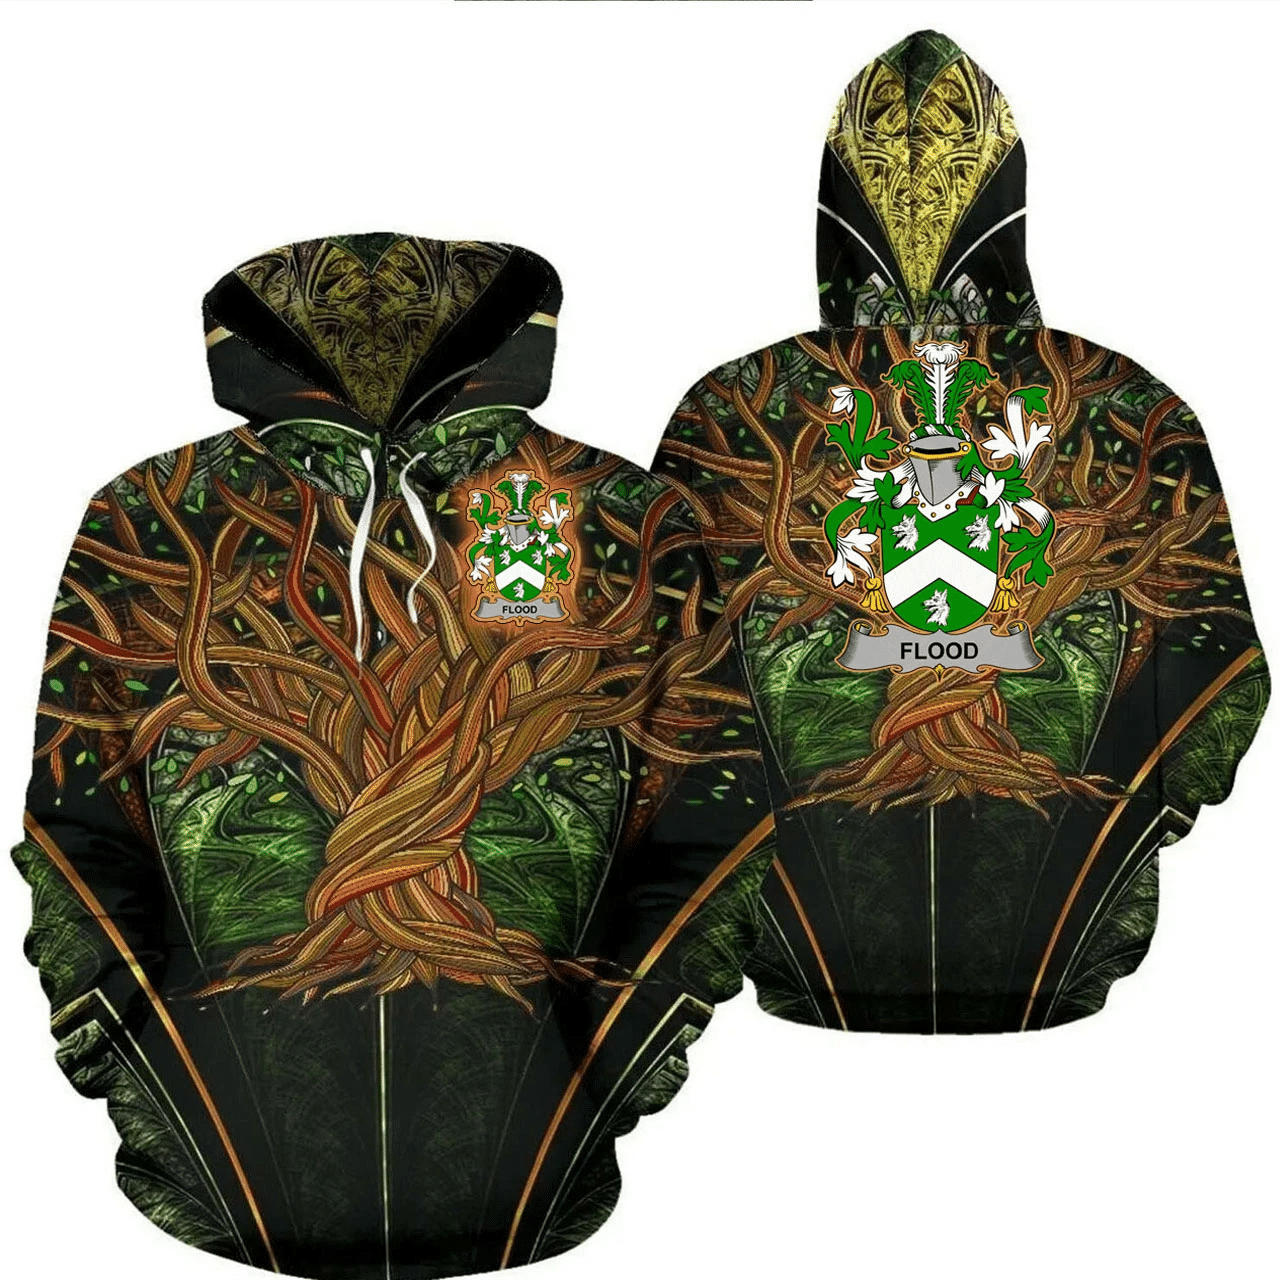 1stIreland Ireland Hoodie - Flood Irish Family Crest Hoodie - Tree Of Life A7